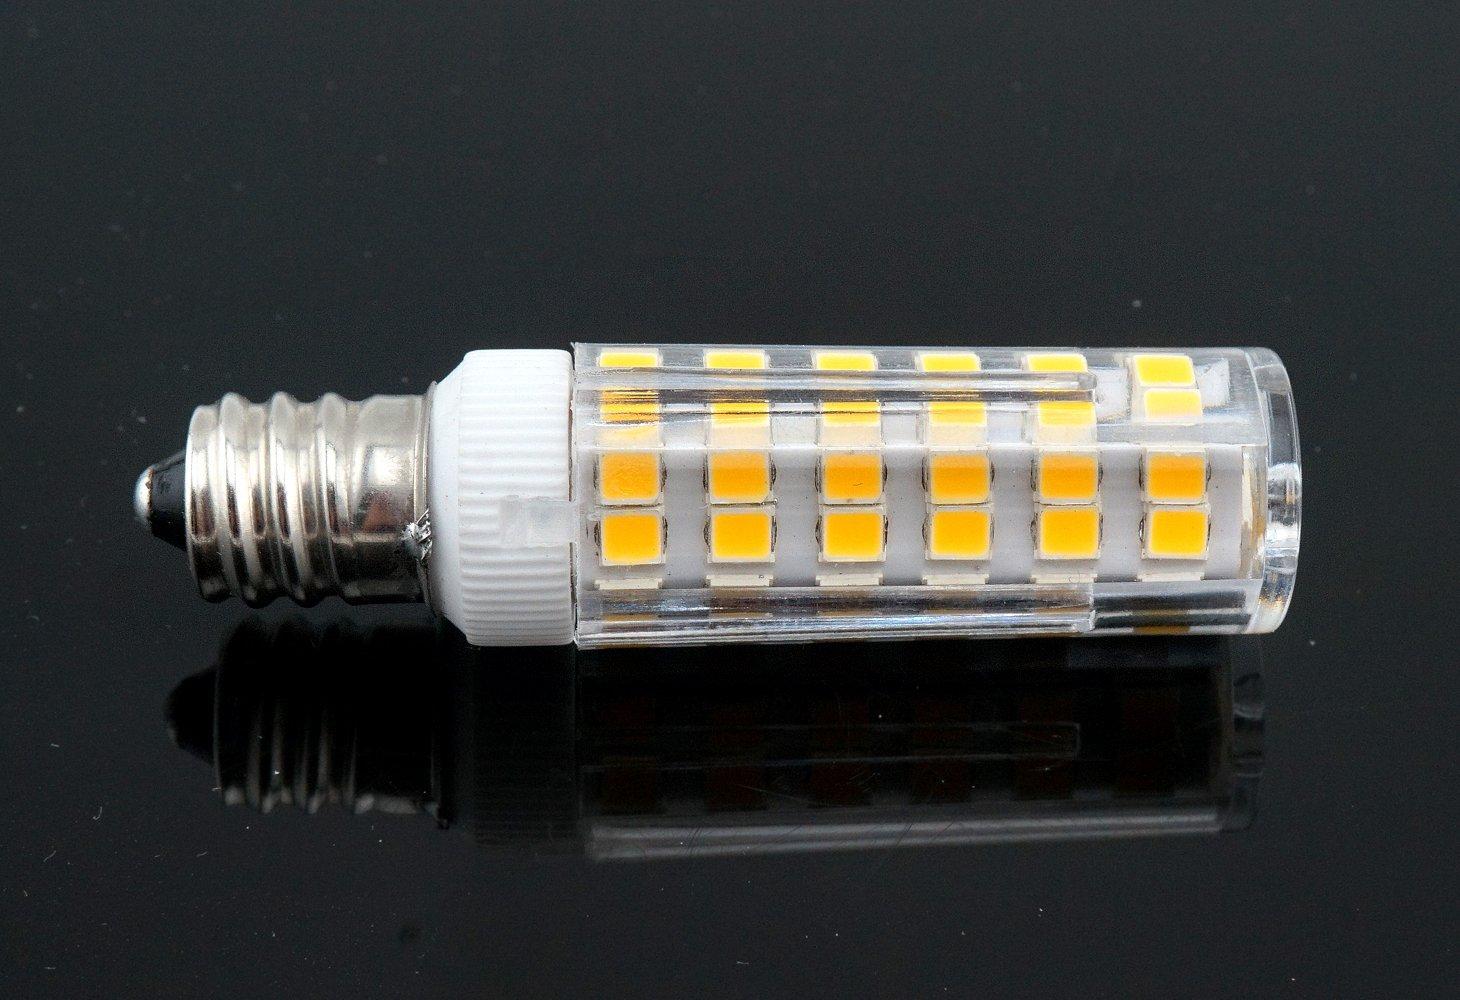 Bonlux 7W Dimmable E12 Candelabra LED Bulbs 60W Equivalent 3000k Warm White T3//T4 Candelabra E12 Base Omni-Directional E12 Replacement Bulb for Ceiling Fan Chandelier Landscape Lighting Pack of 4